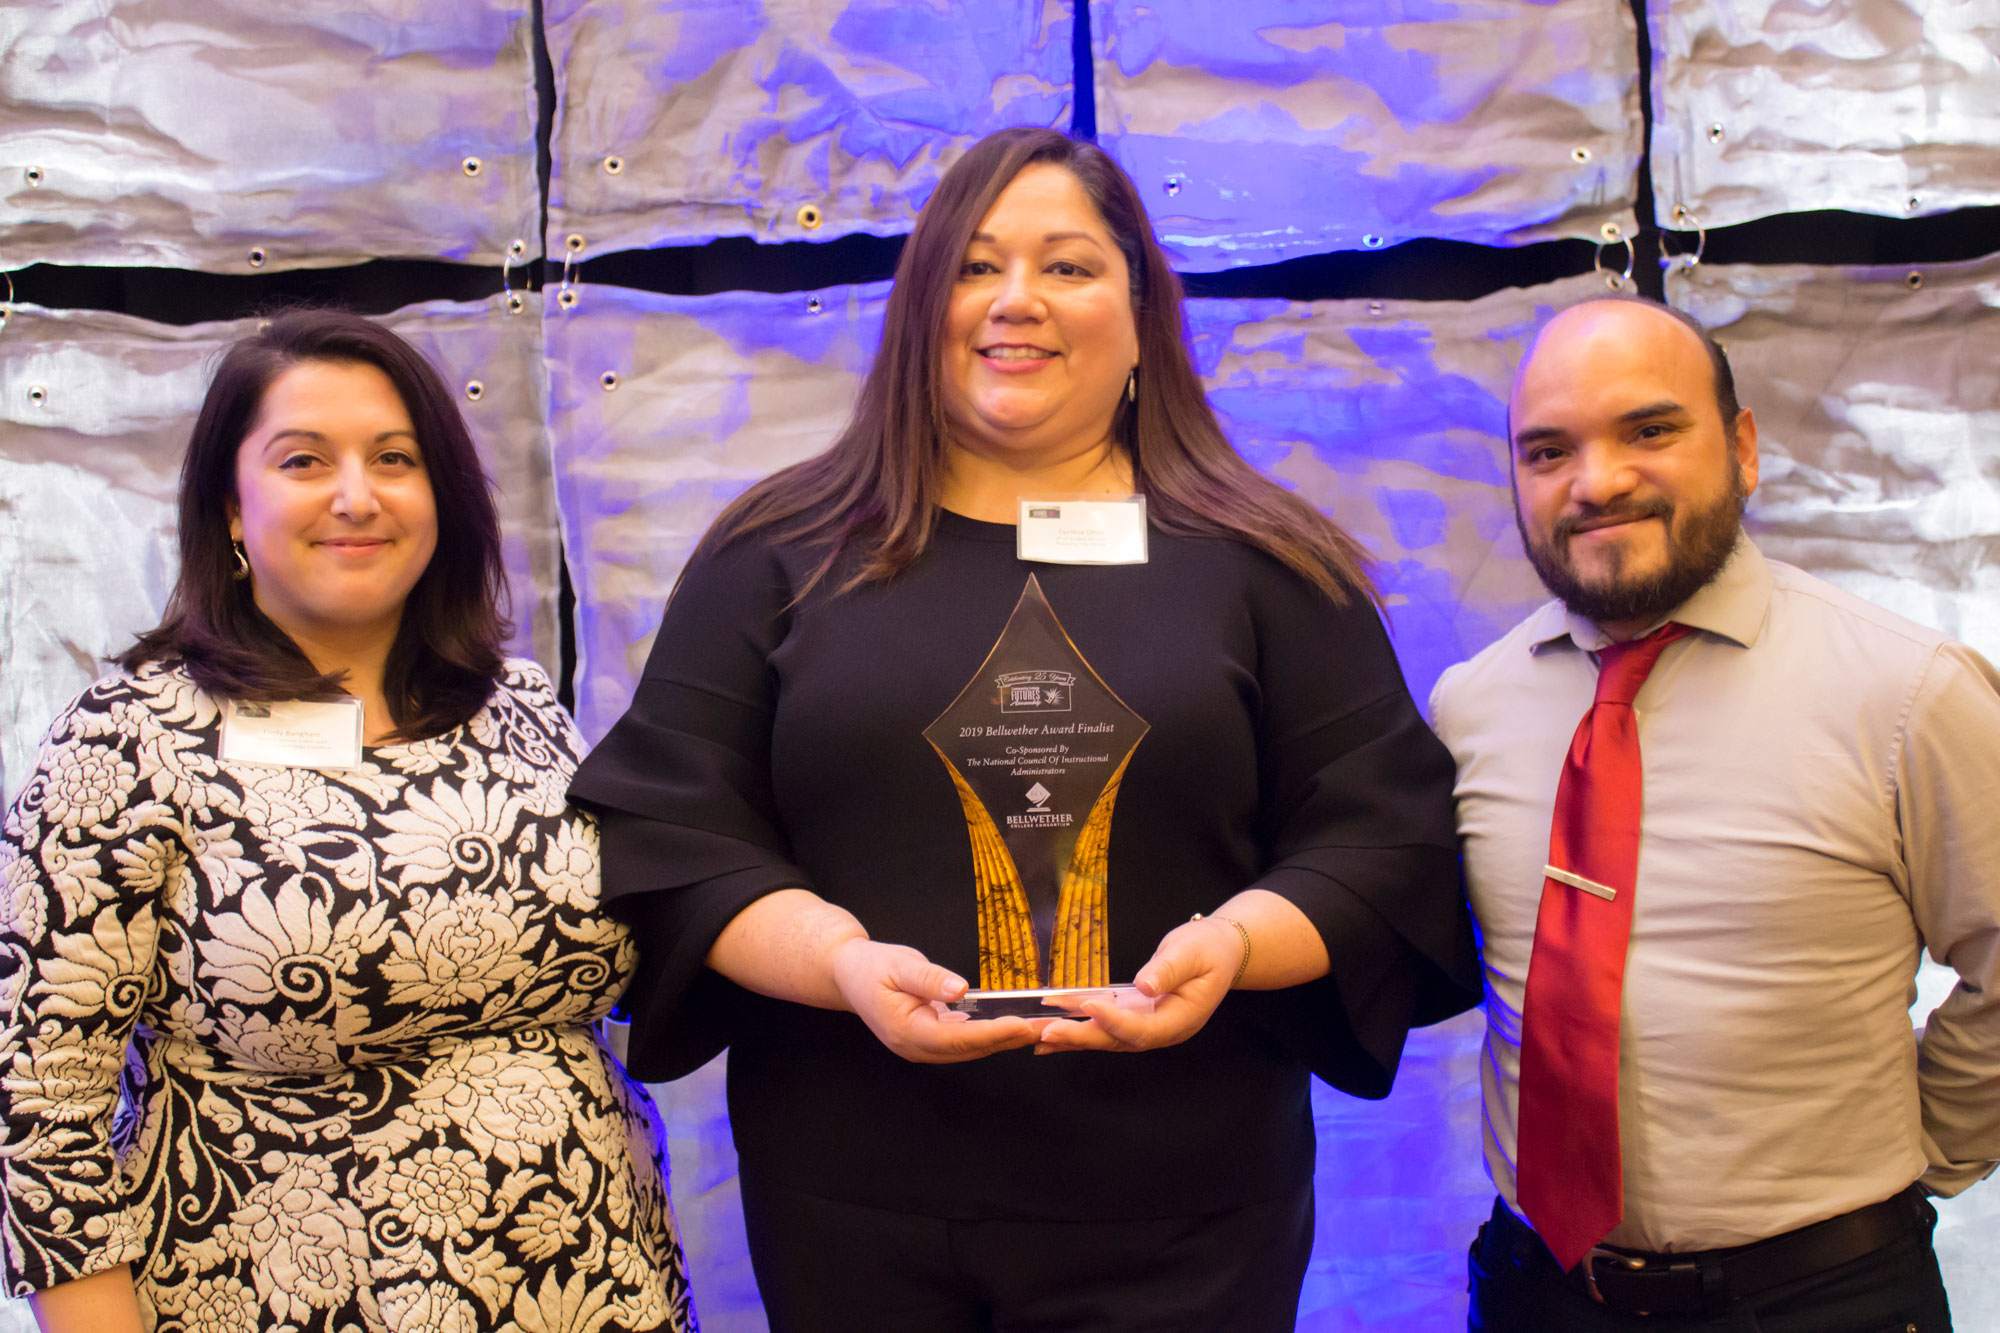 Jam awarded the prestigious Bellweather award